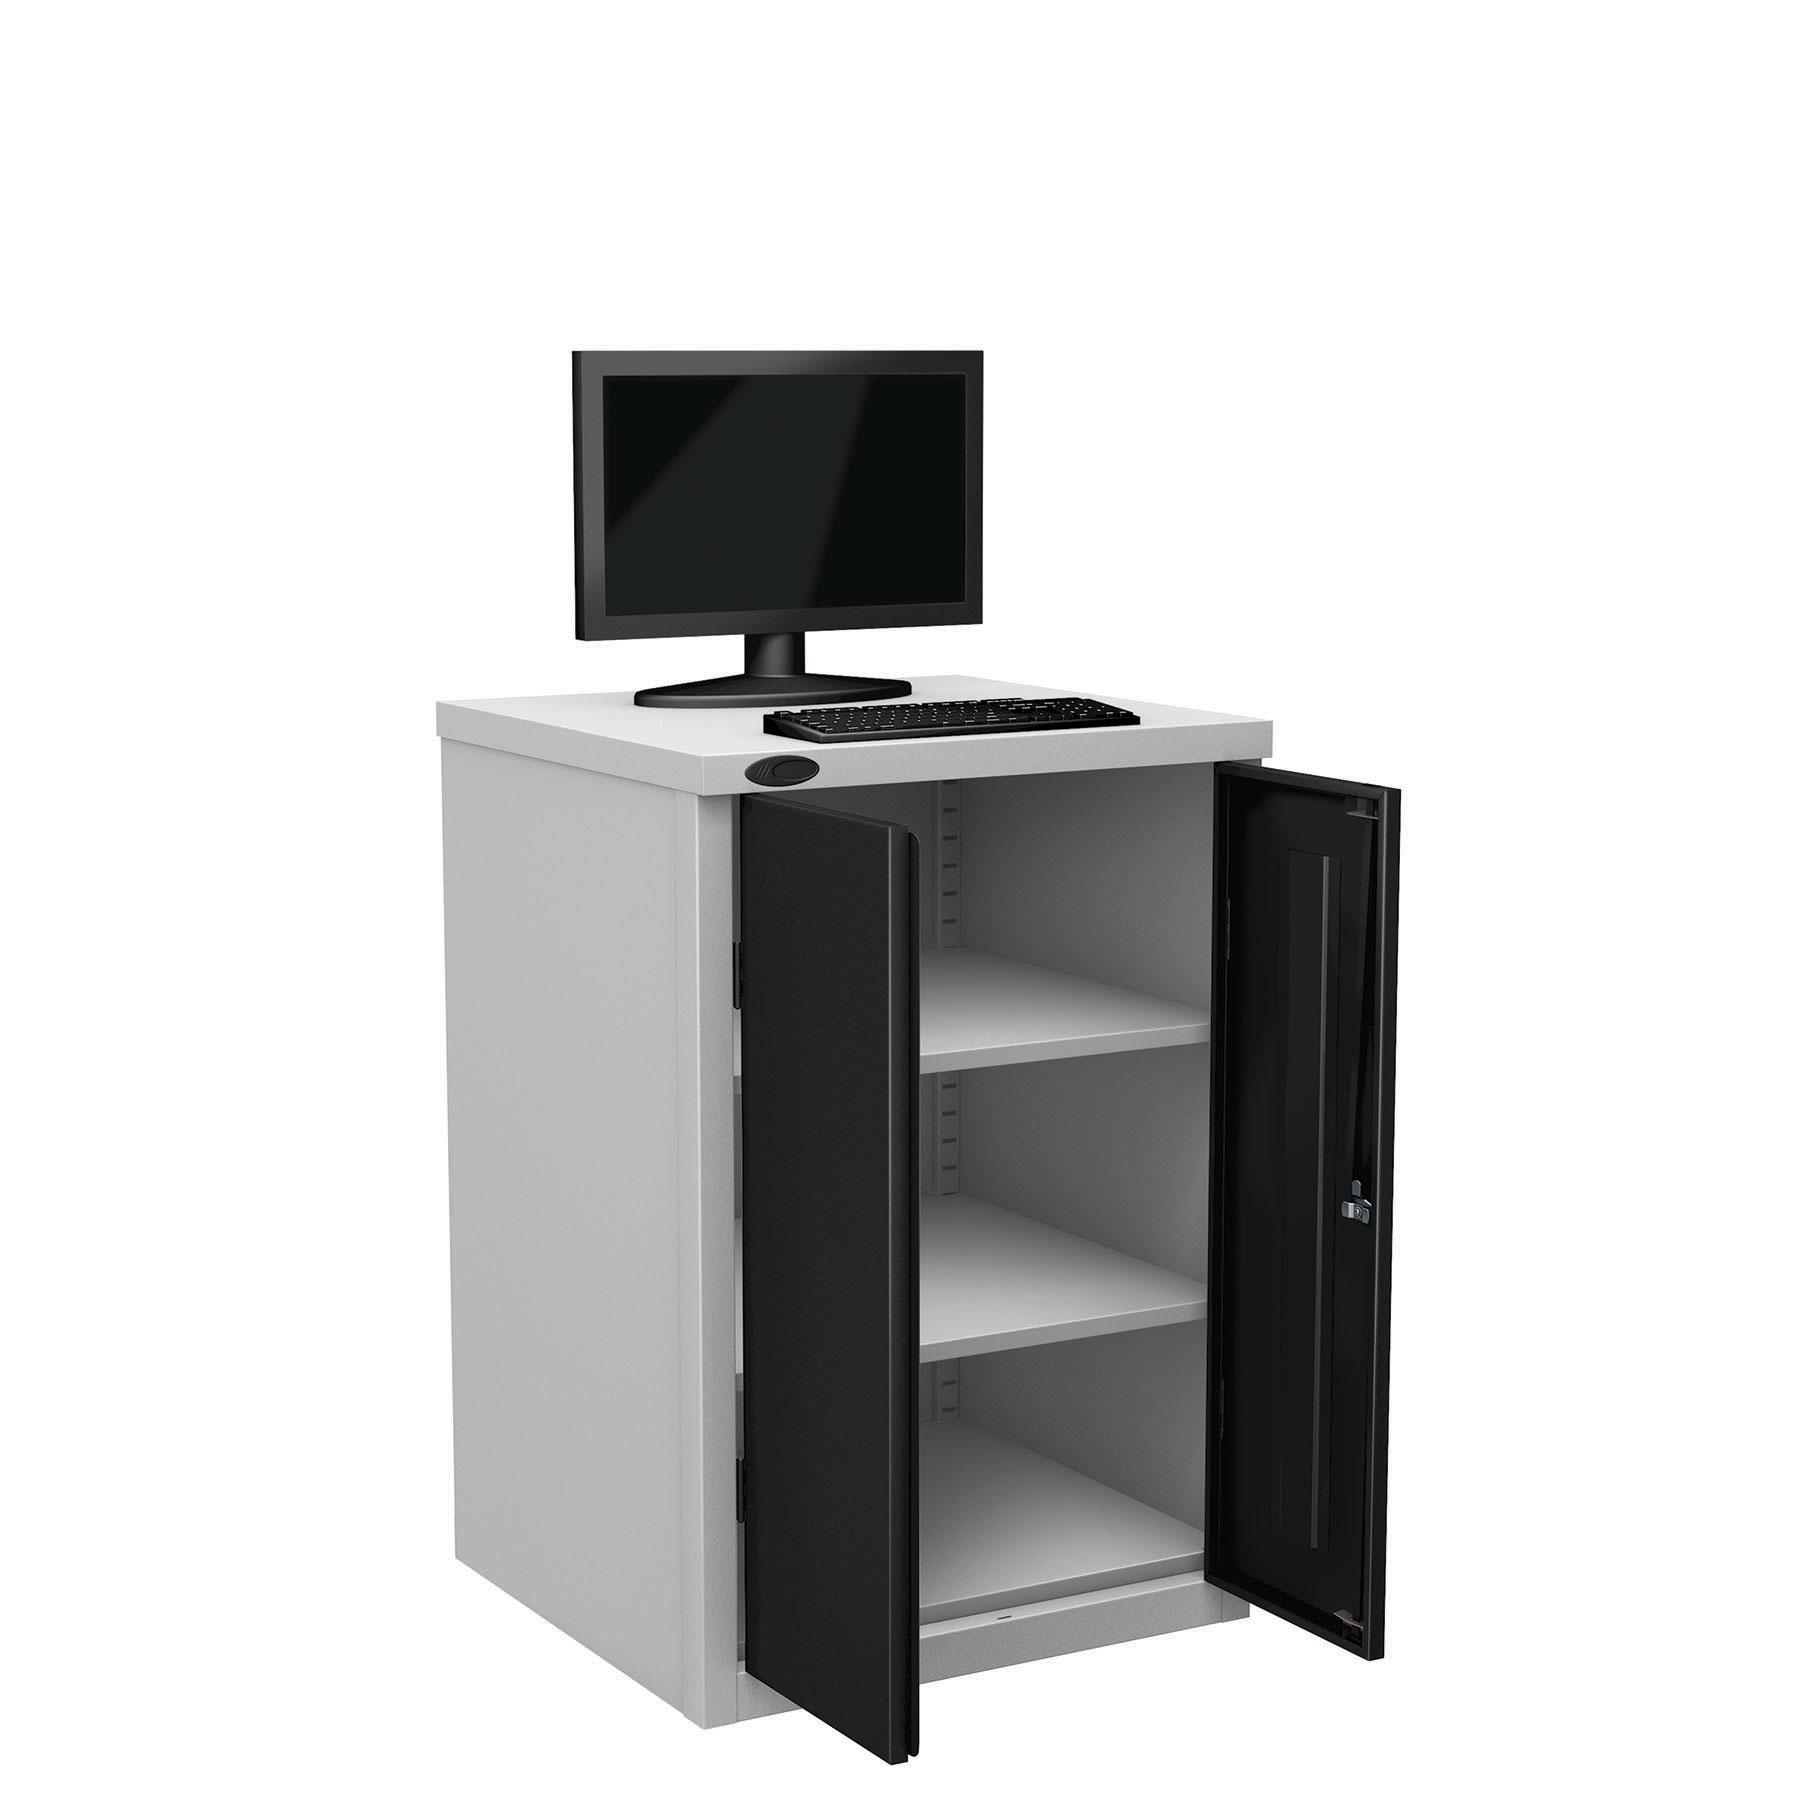 Probe workstation base monitor black